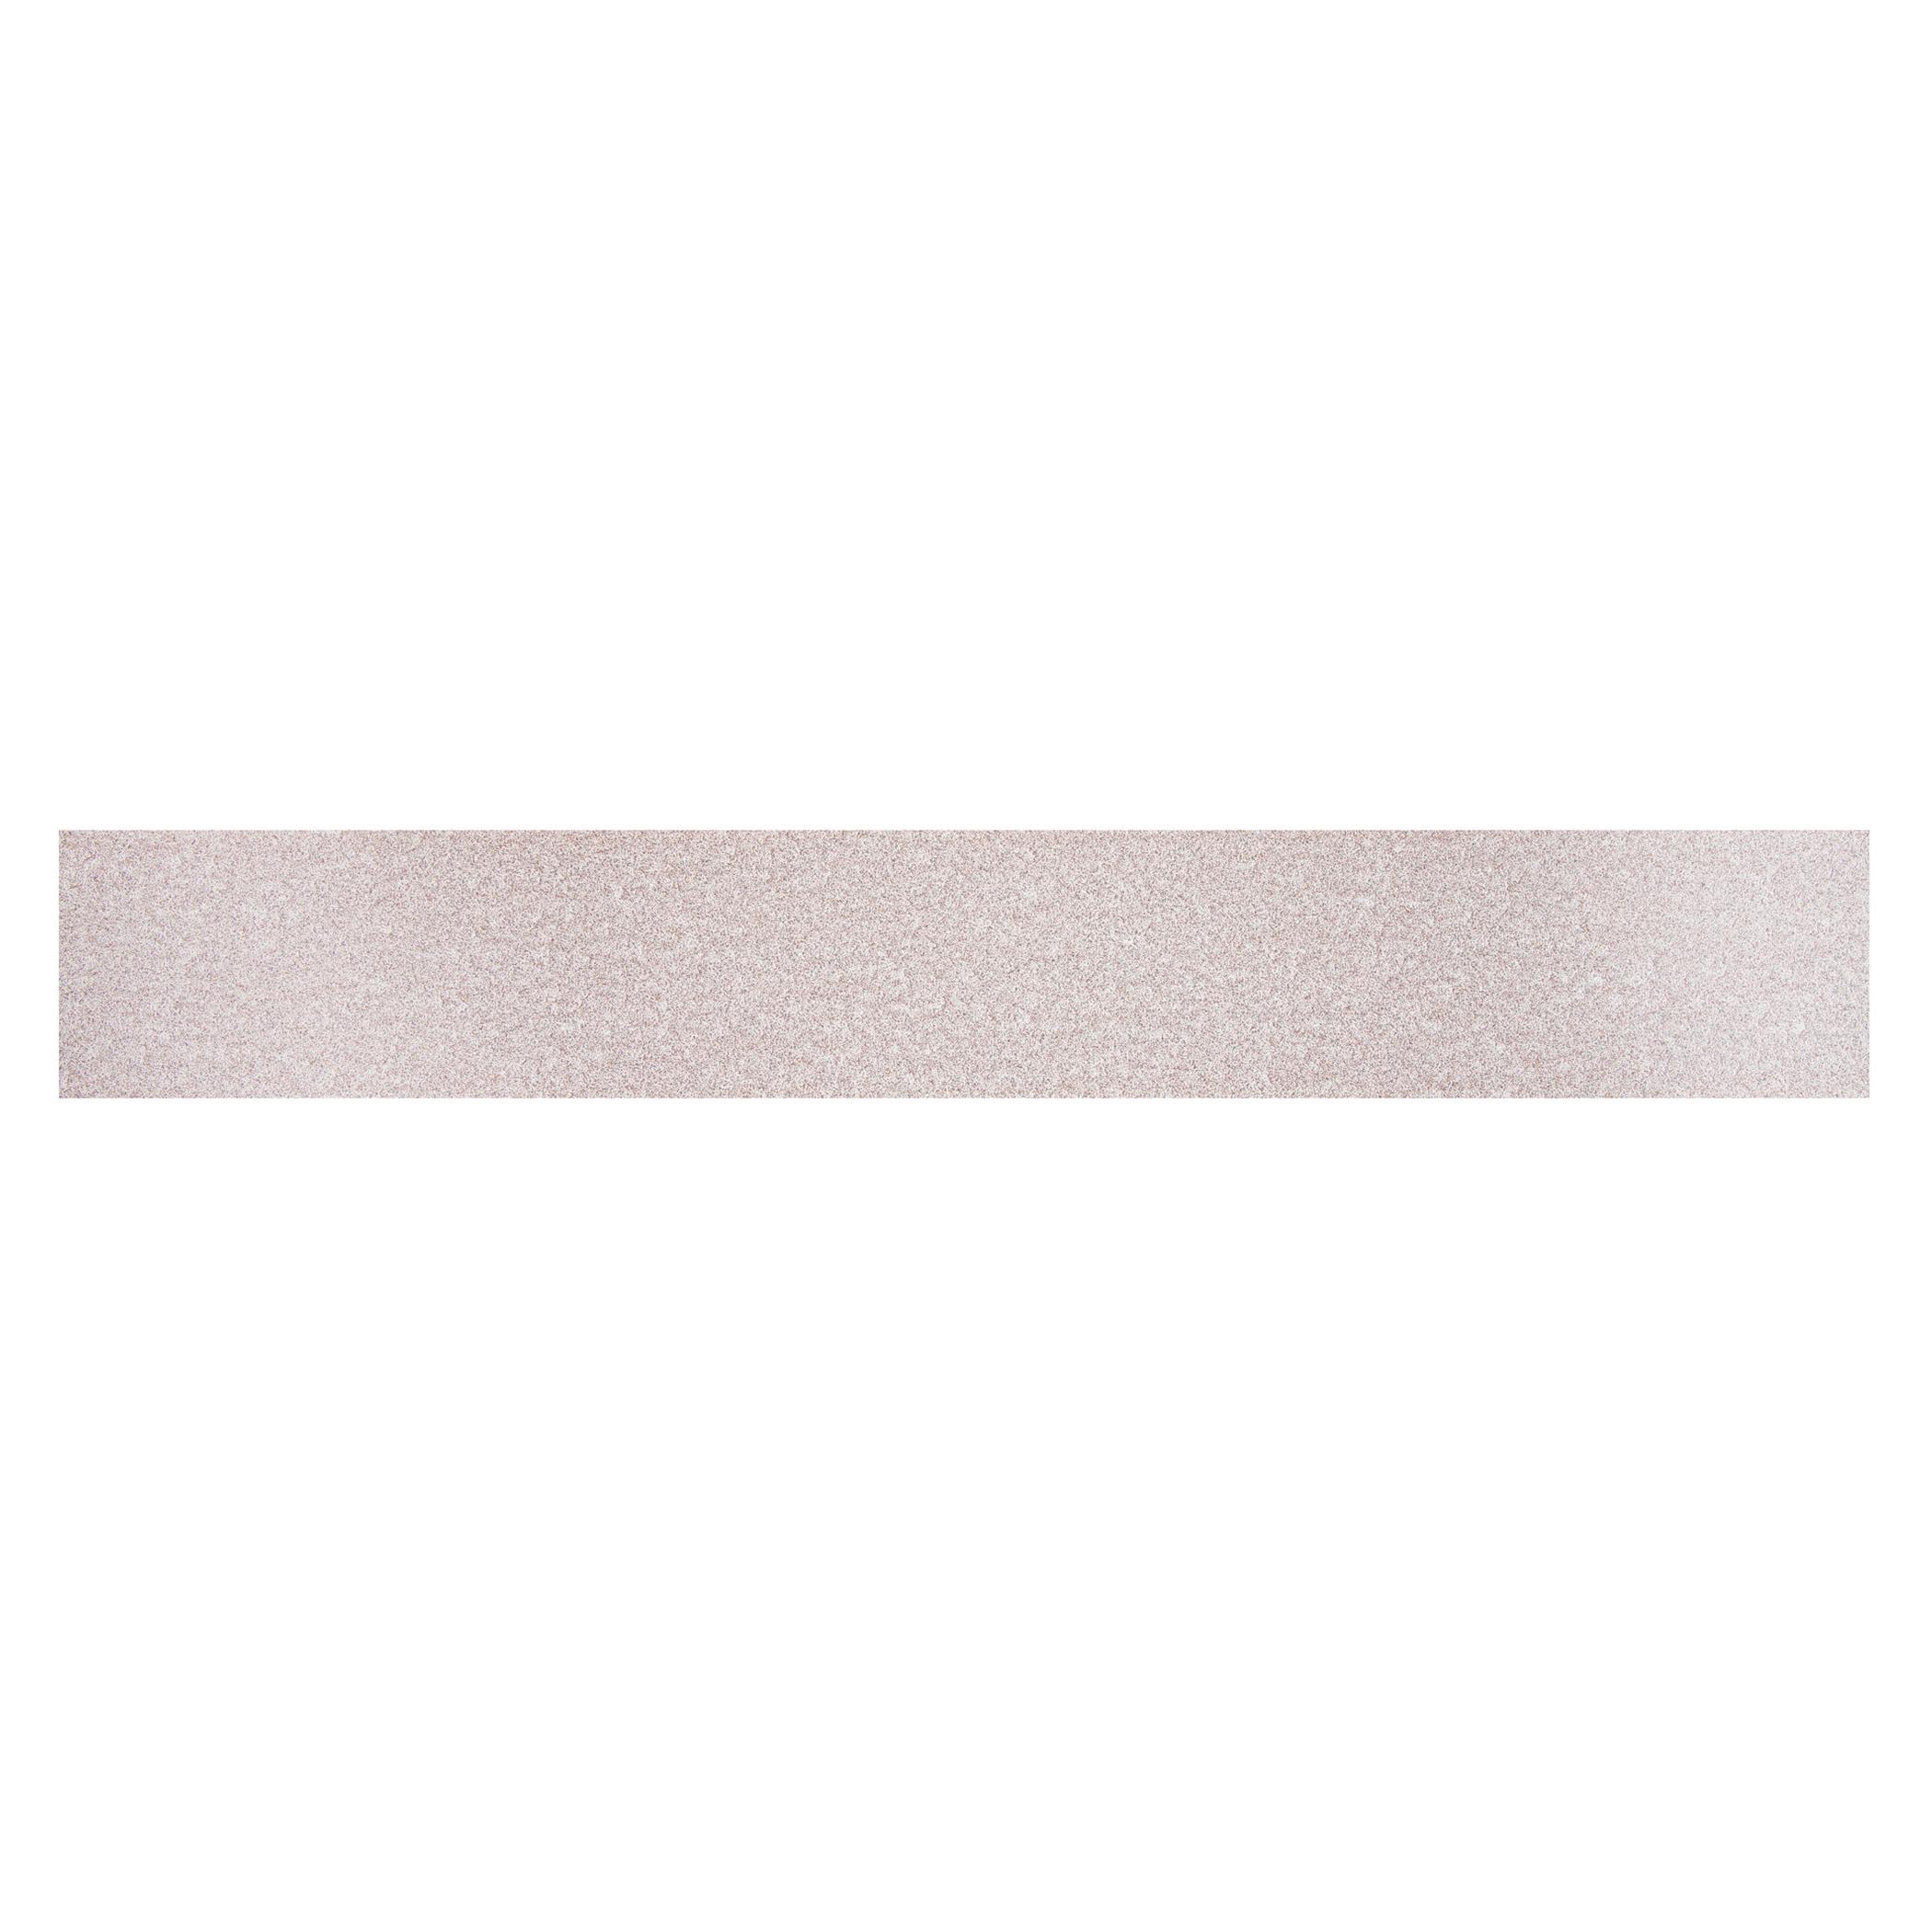 Norton® 66261131652 A275OP Non-PSA Coated File Strip, 17-1/2 in L x 2-3/4 in W, P80 Grit, Coarse Grade, Aluminum Oxide Abrasive, Anti-Loading Paper Backing